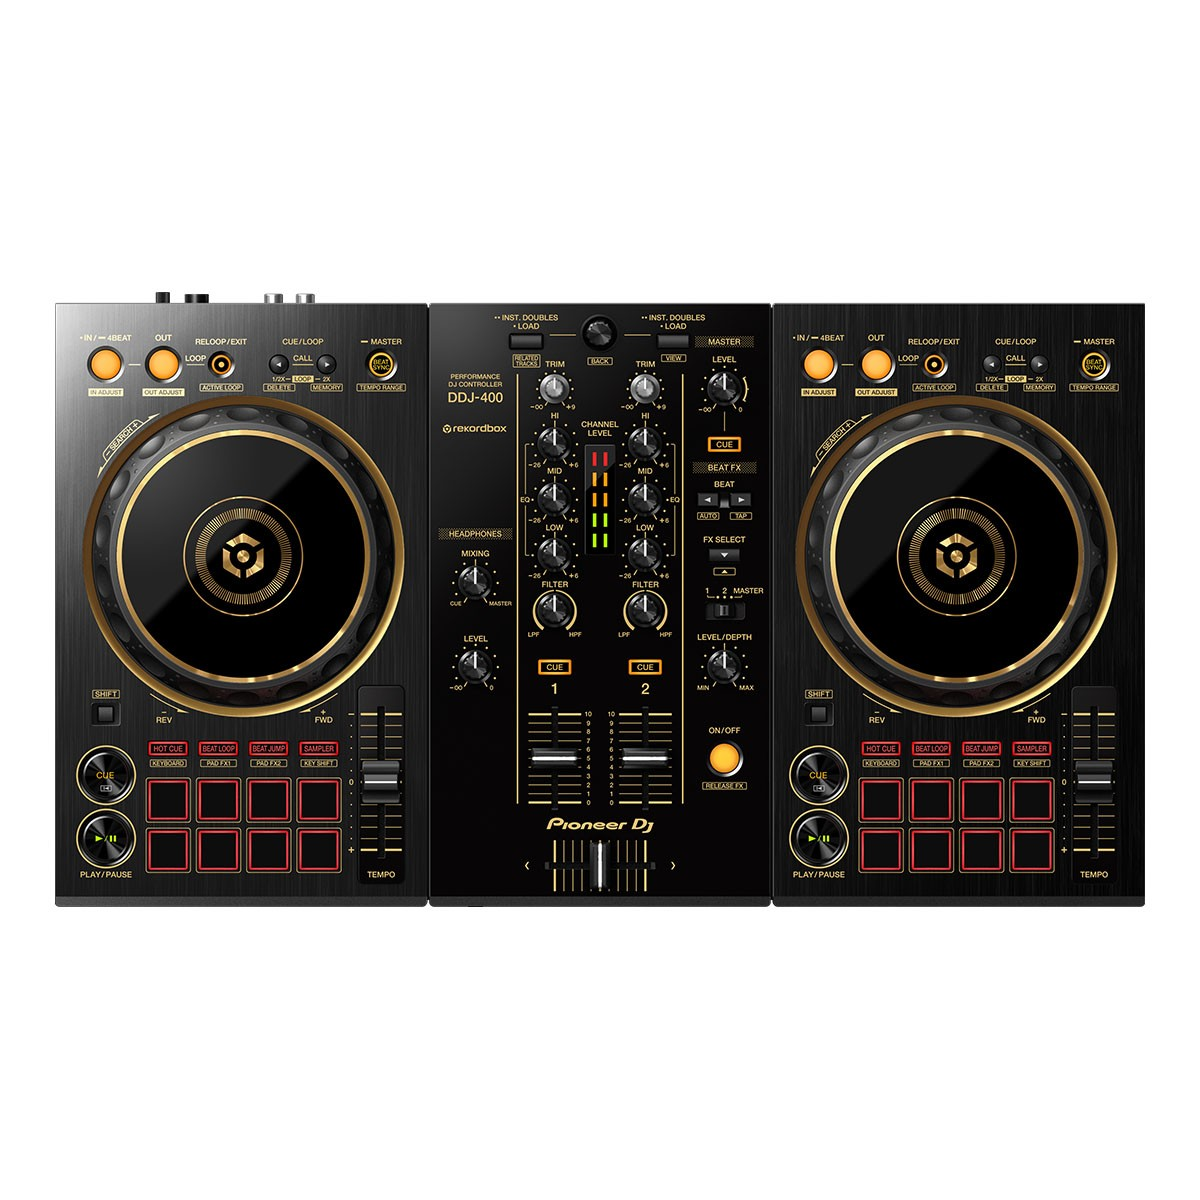 Controladora Pioneer DJ DDJ 400 N Gold